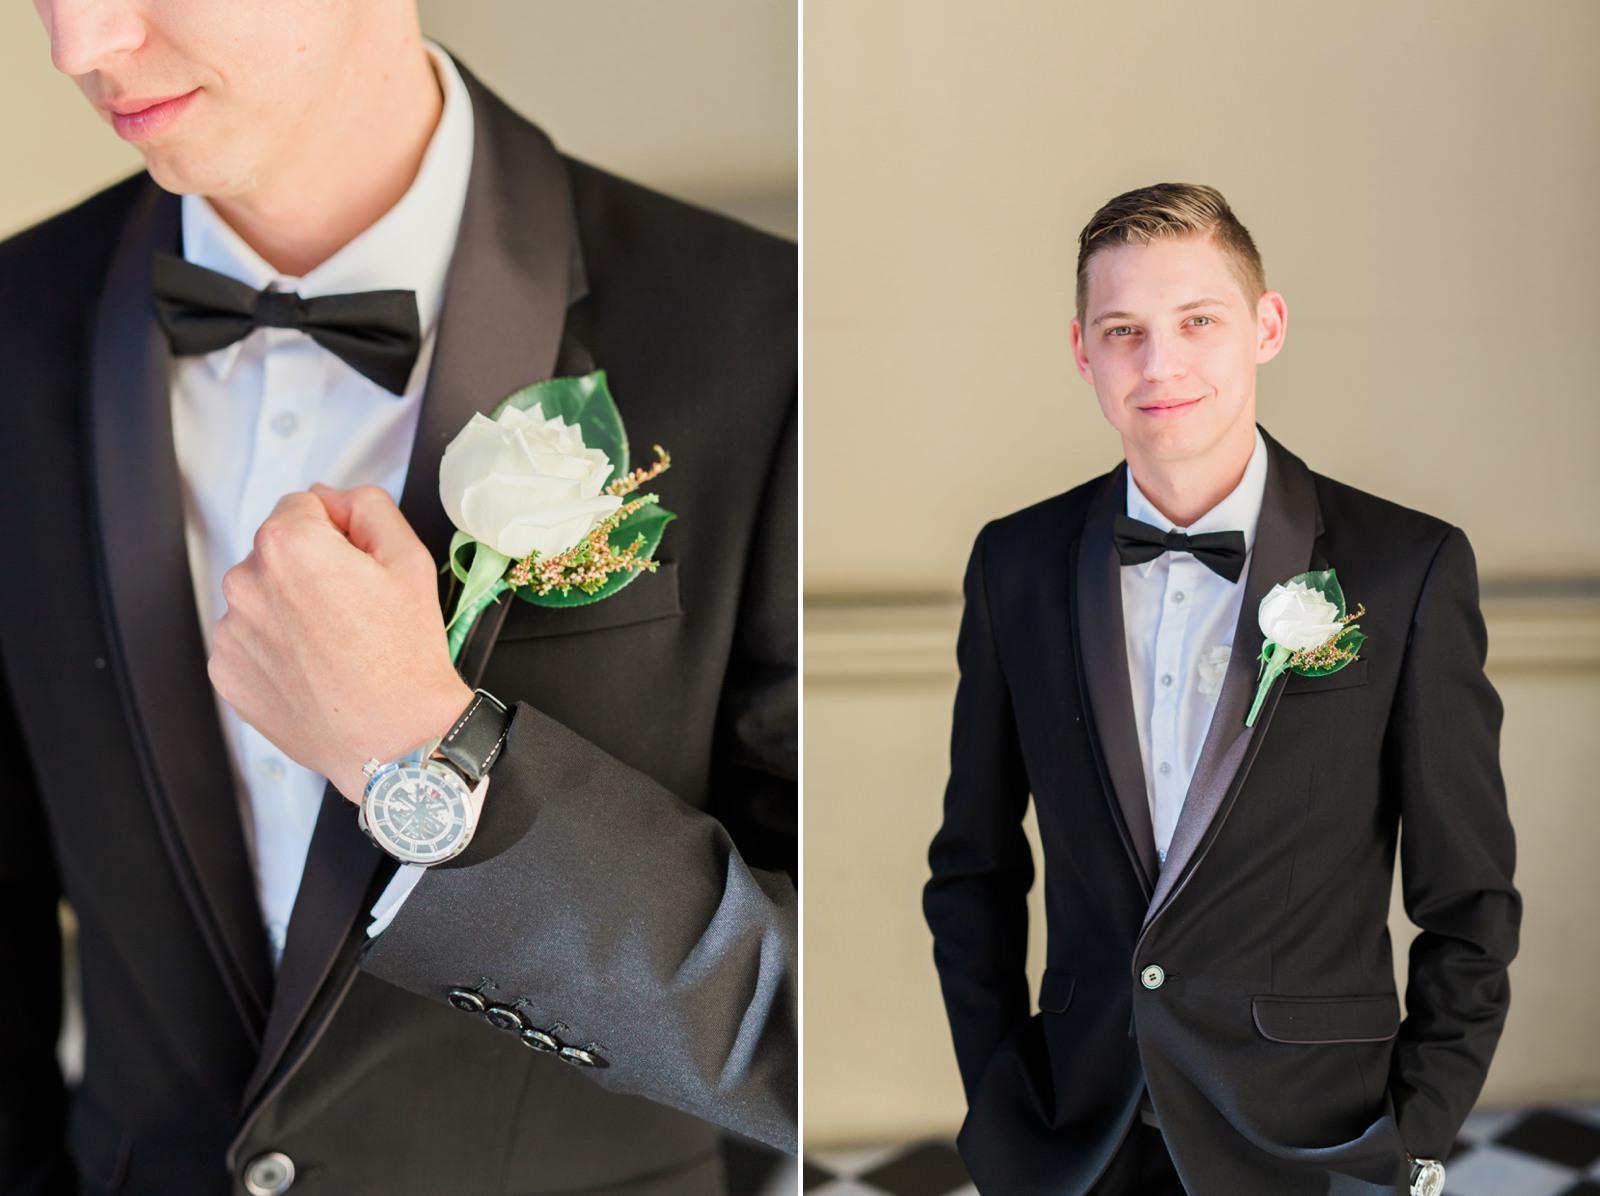 Customs House Brisbane wedding by Mario Colli Photography